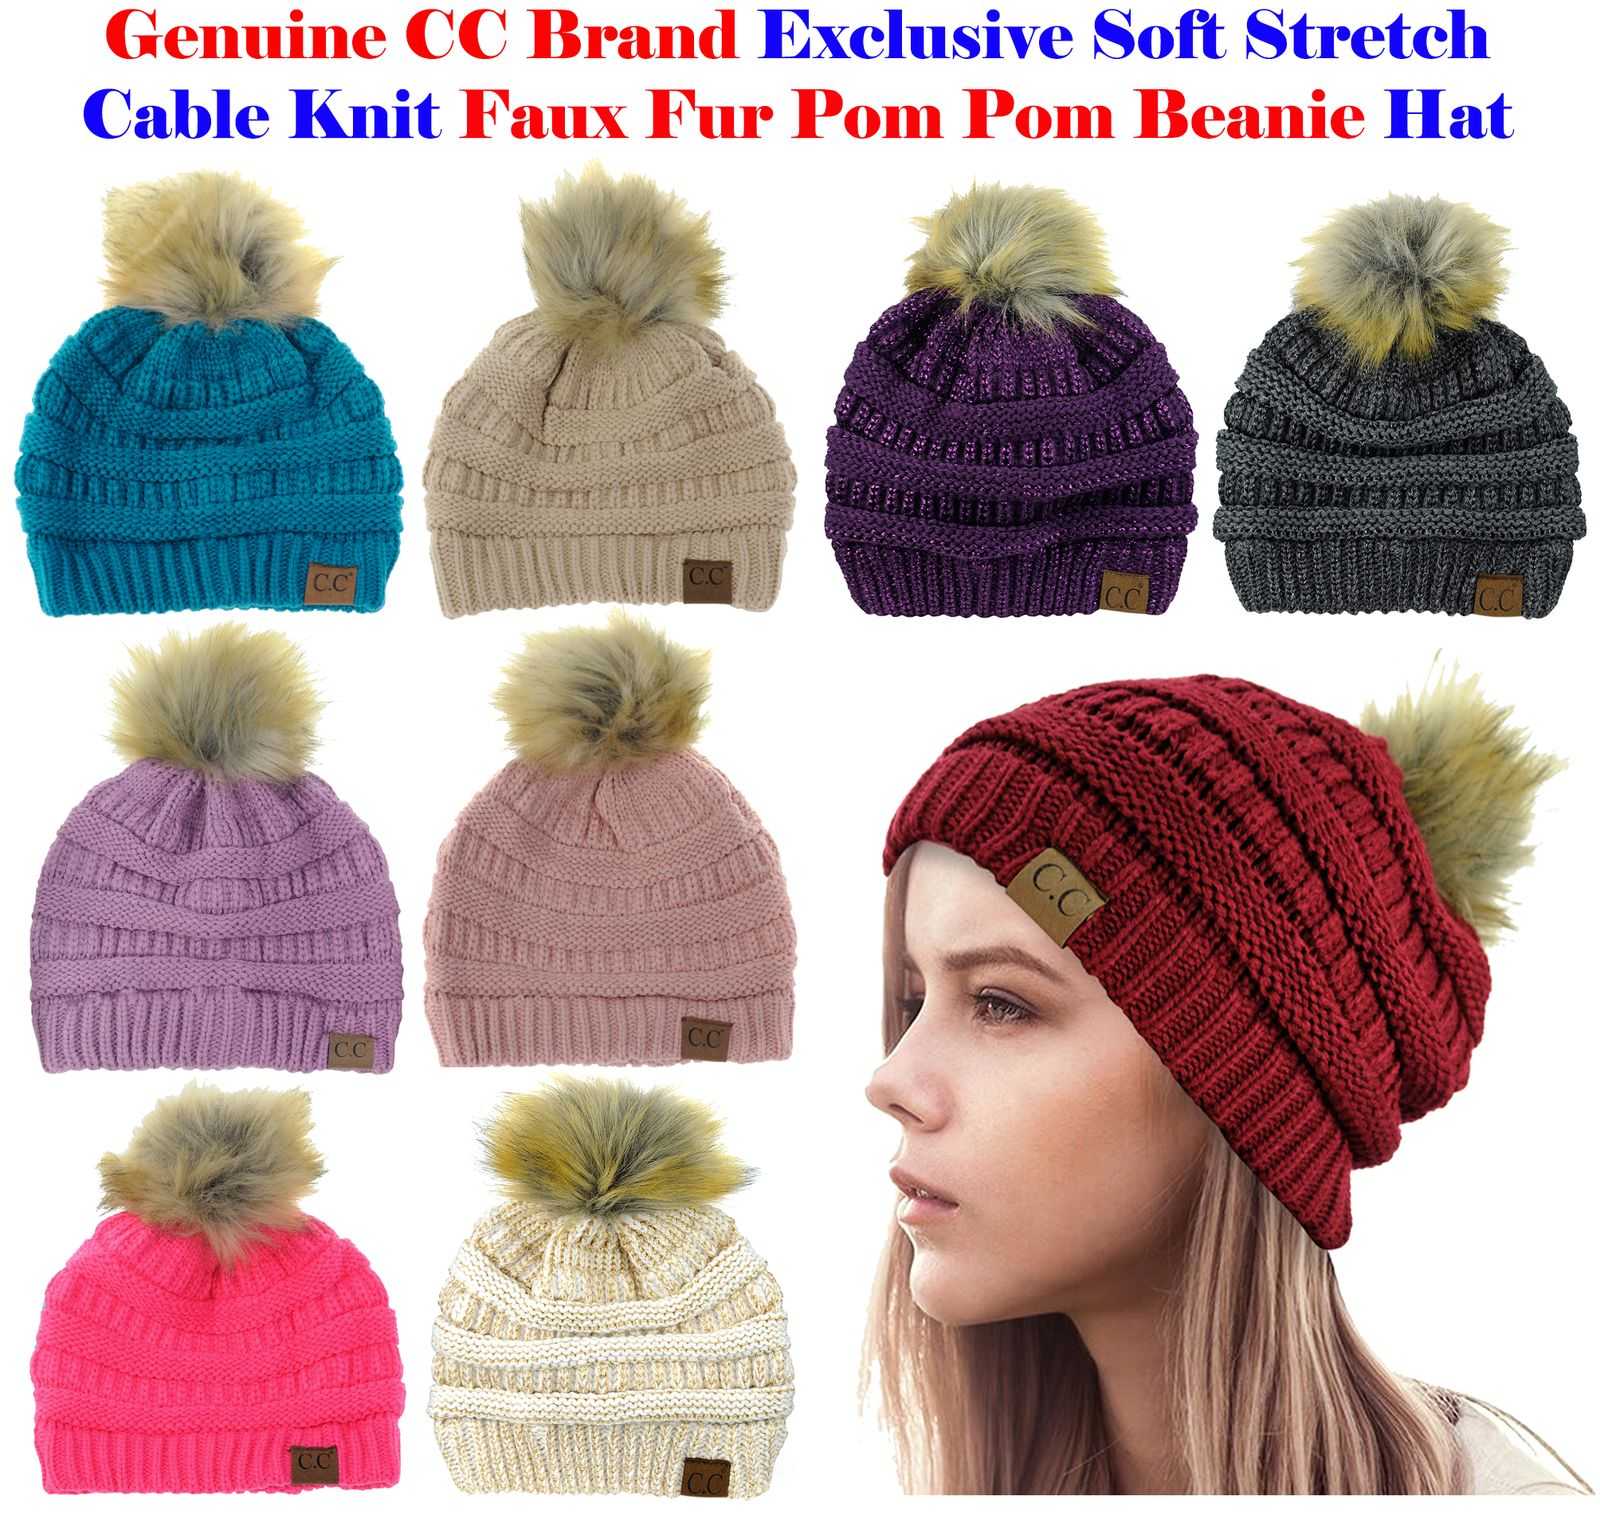 Hats 45230  New! Cc Brand Exclusive Soft Stretch Cable Knit Faux Fur Pom Pom 9c0c93ec689